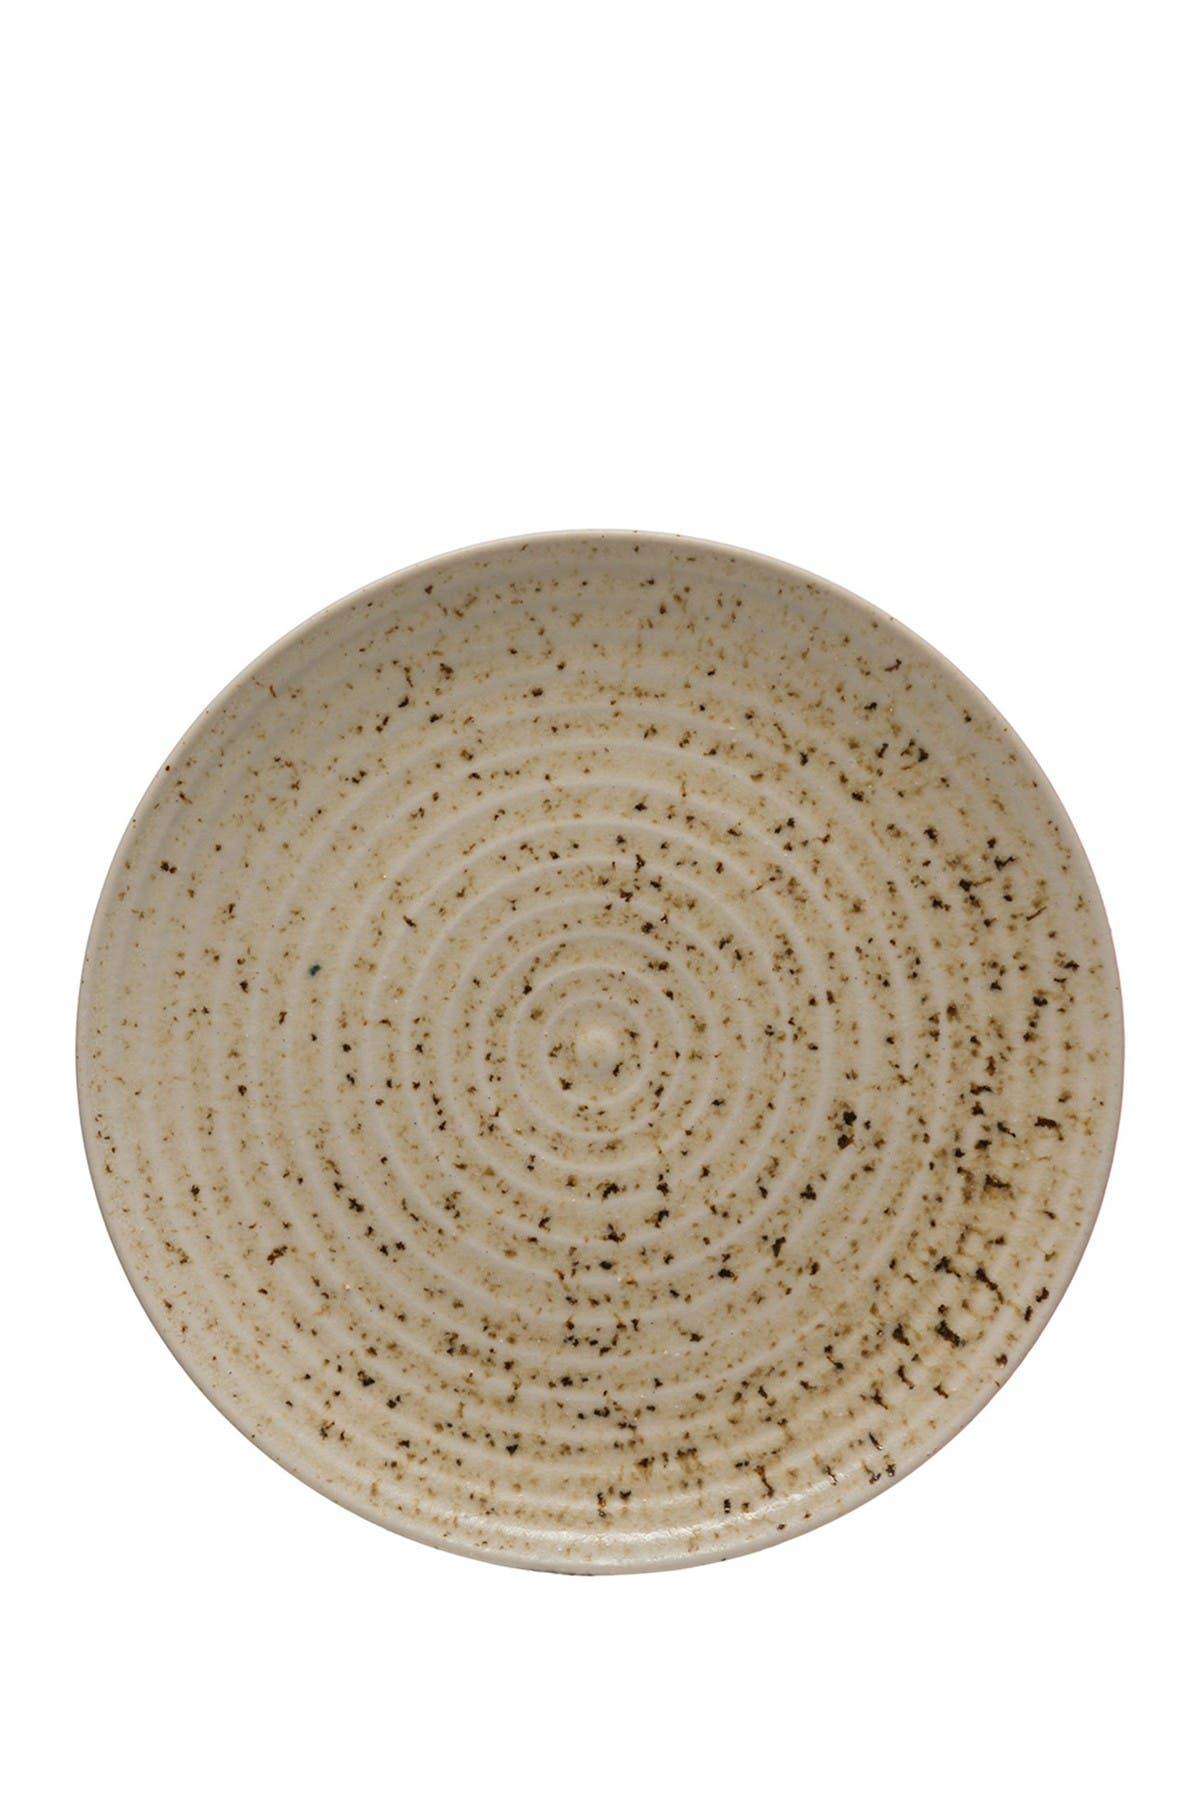 Image of Creative Co-op Beige/Brown Reactive Glaze Round Stoneware Plate